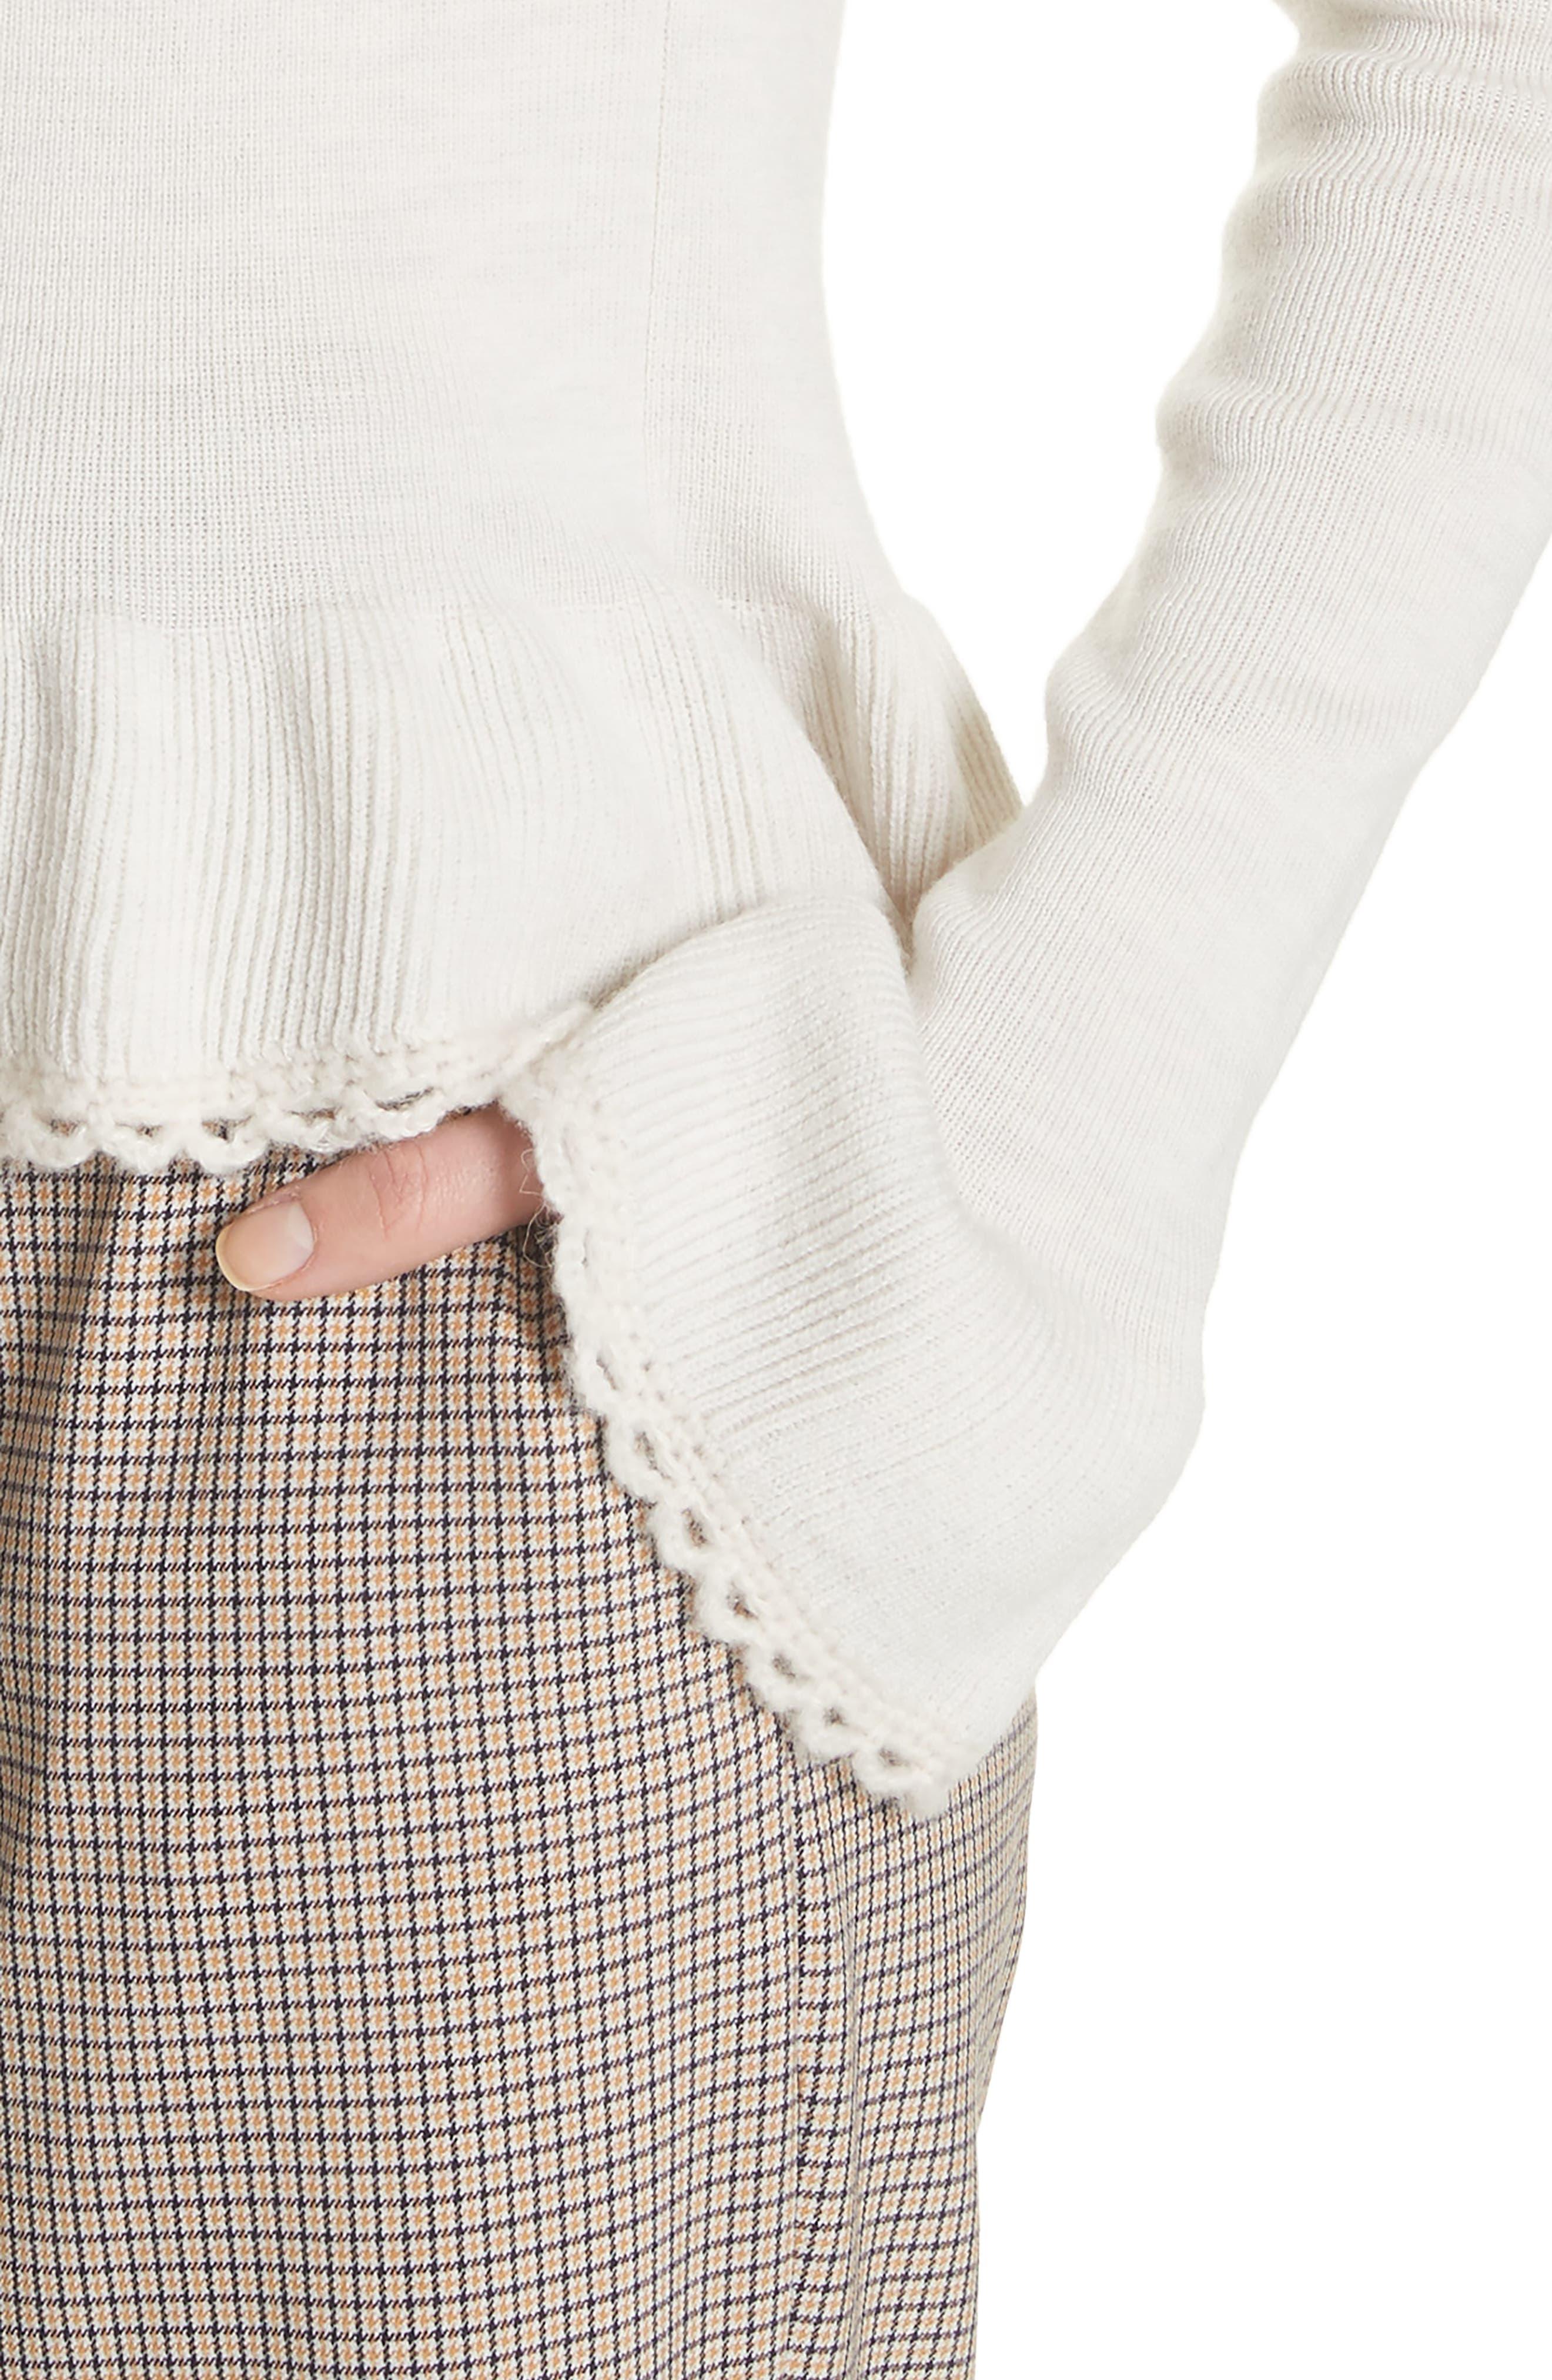 Peplum Wool Sweater,                             Alternate thumbnail 4, color,                             MISTY IVORY